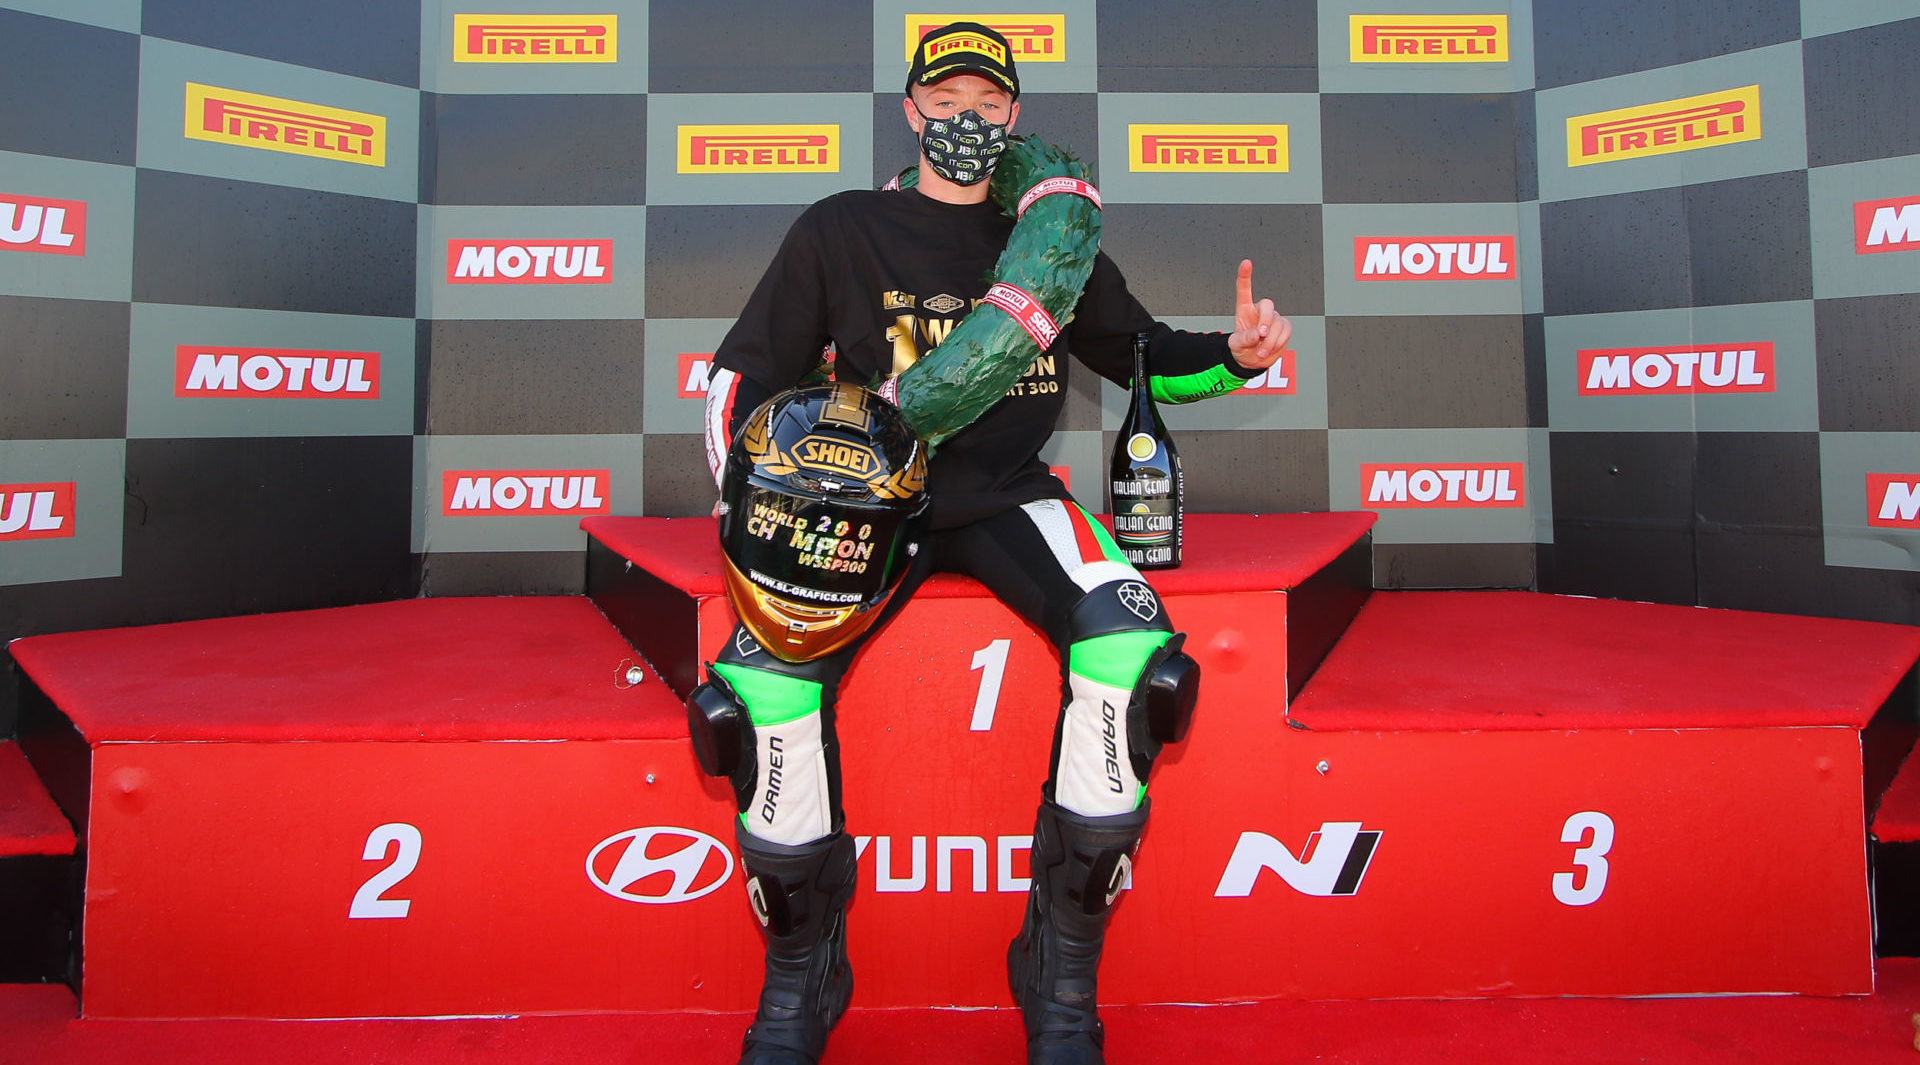 Jeffrey Buis, the 2020 FIM Supersport 300 World Champion. Photo courtesy Dorna.